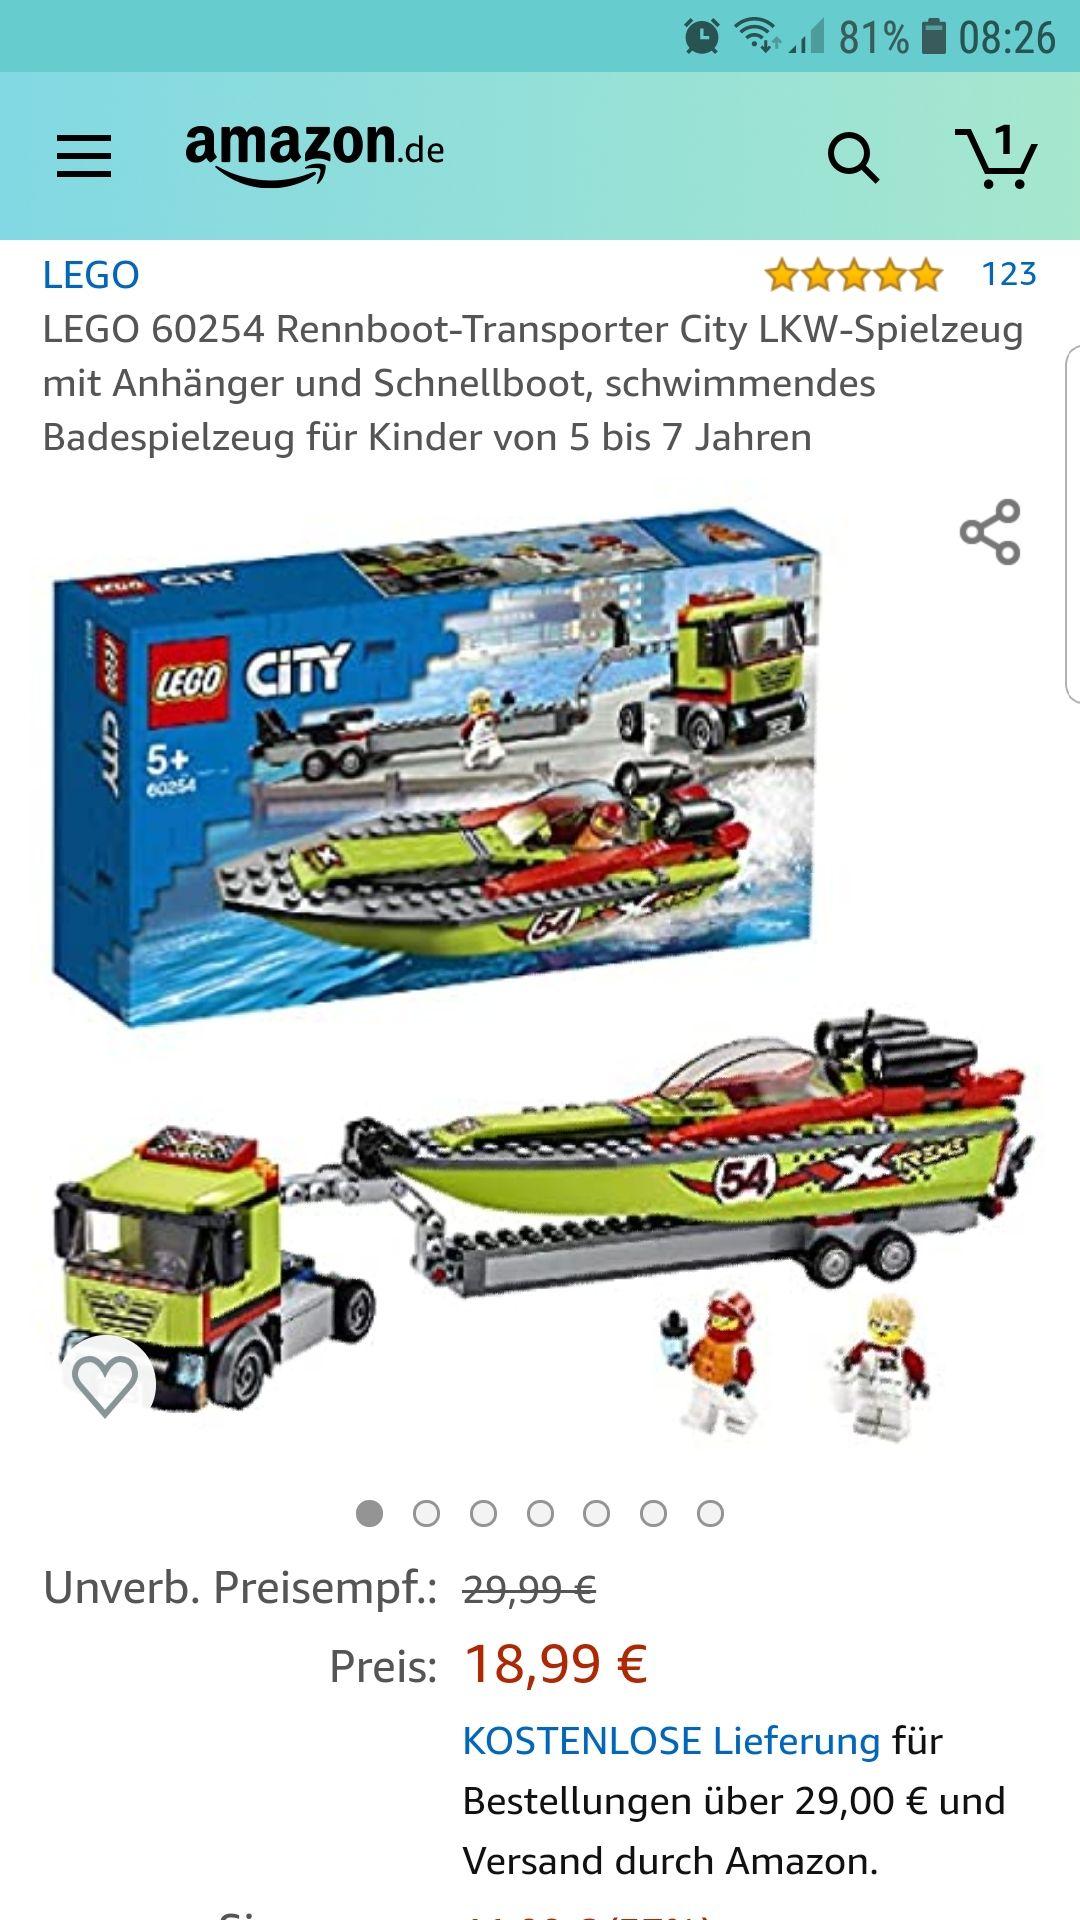 Amazon LEGO City 60254 Rennboot-Transporter